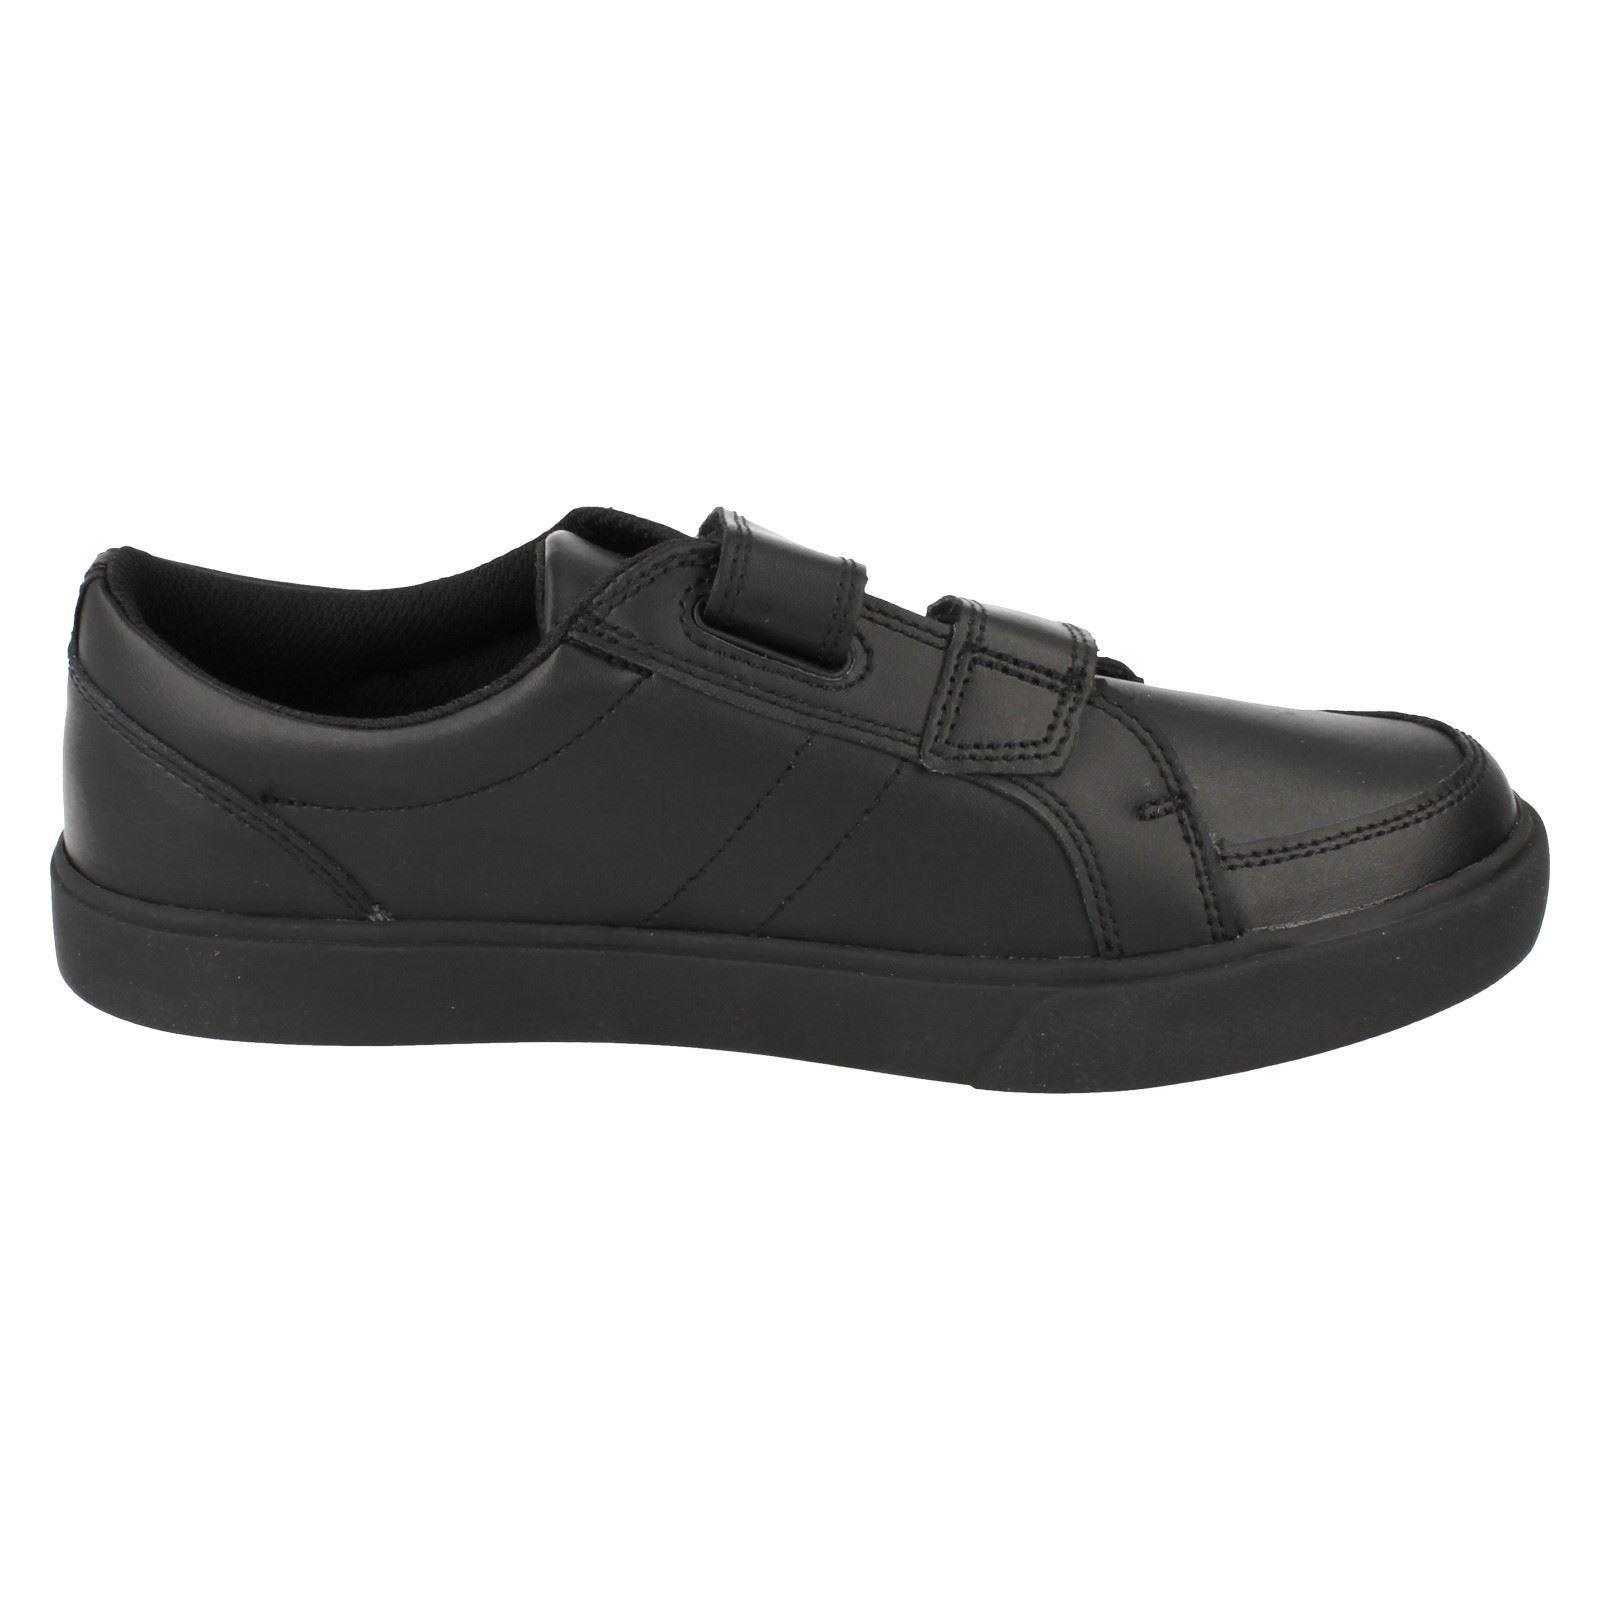 Boys Bootleg Shoes Kensal Race BL